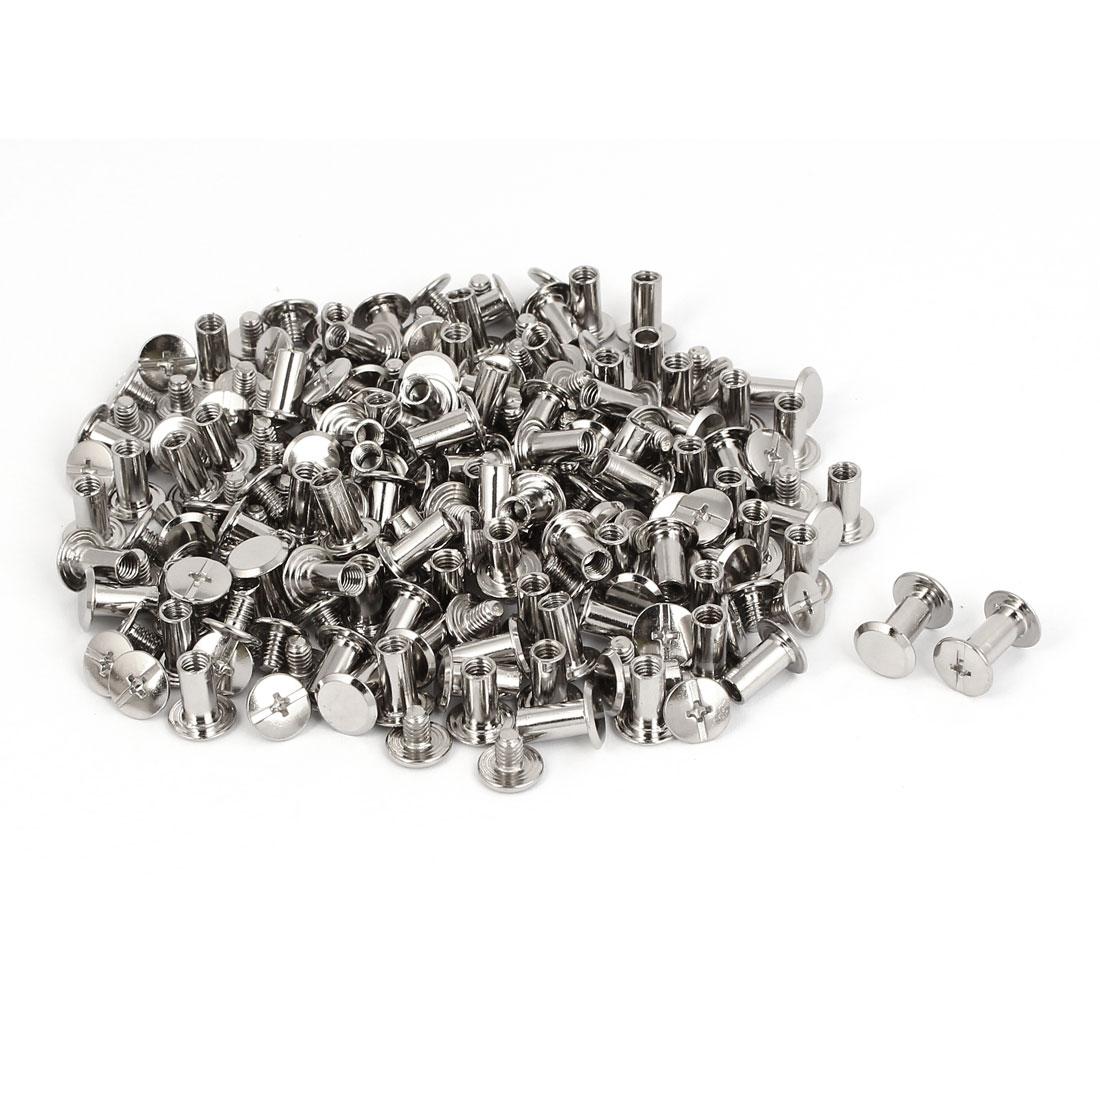 M5x10mm Photo Albums Scrapbook Metal Binding Screw Post Silver Tone 100 Pcs